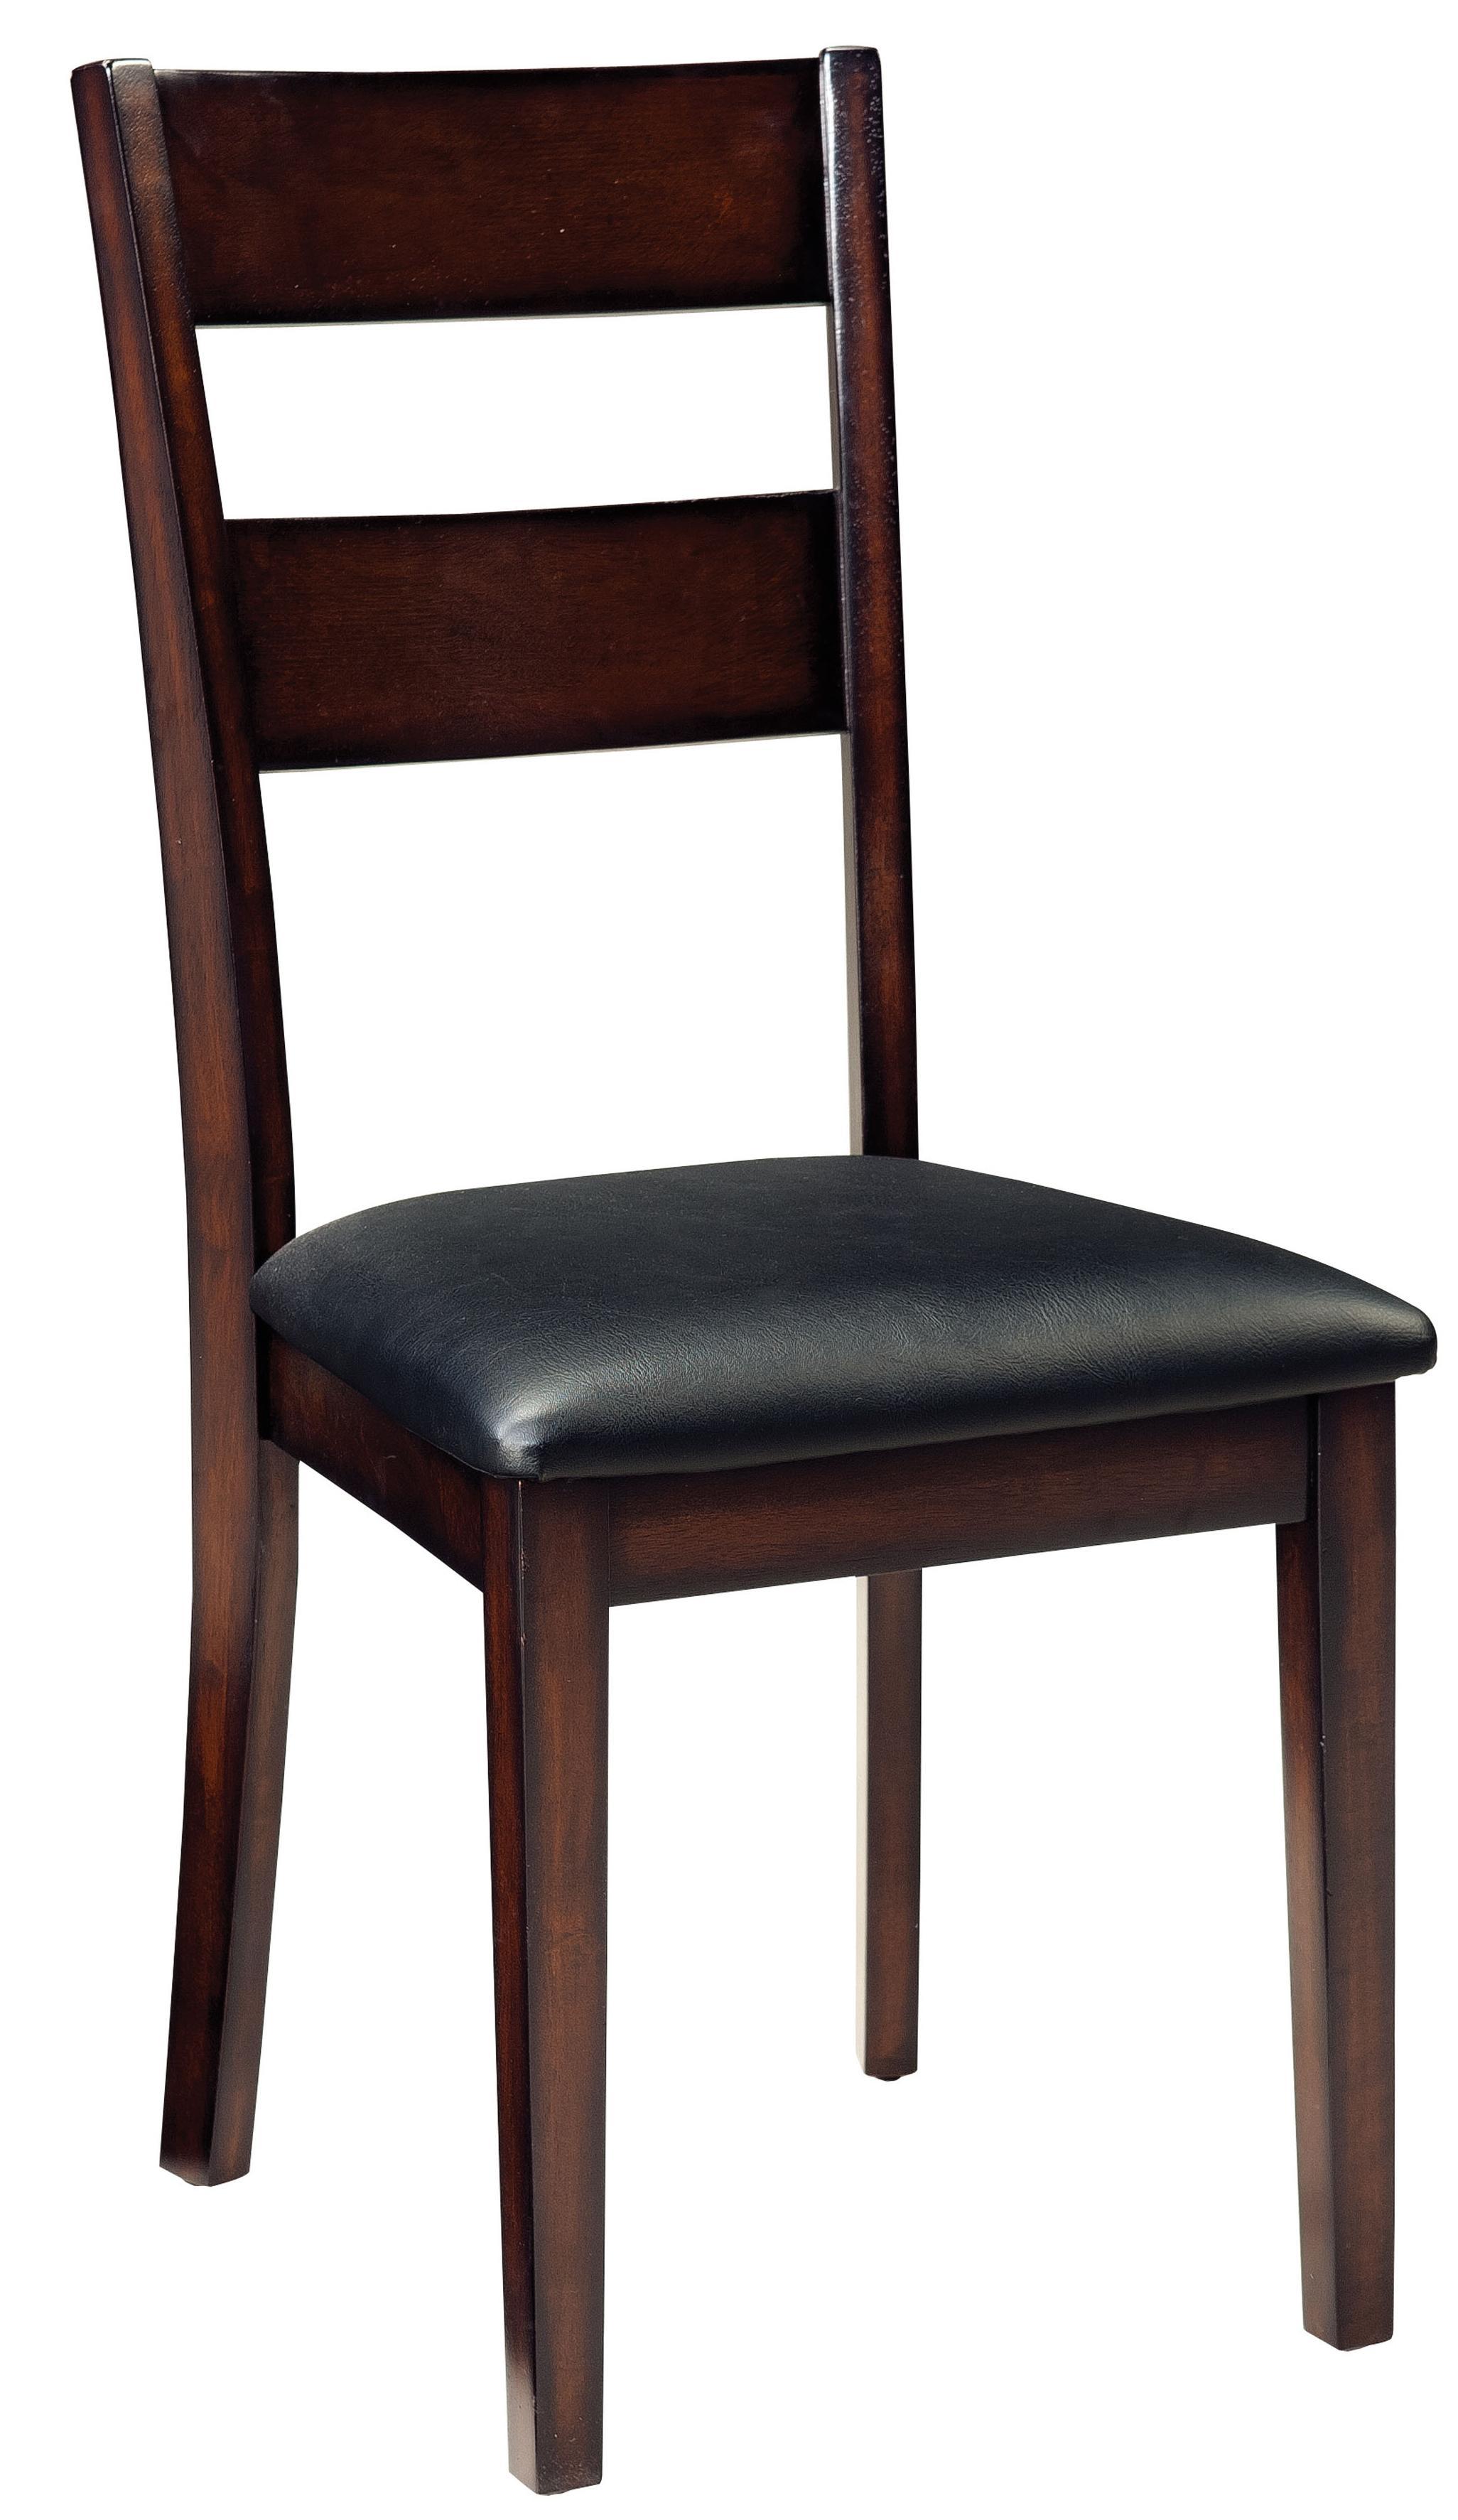 Standard Furniture Pendwood 10022 5 Piece Round Table